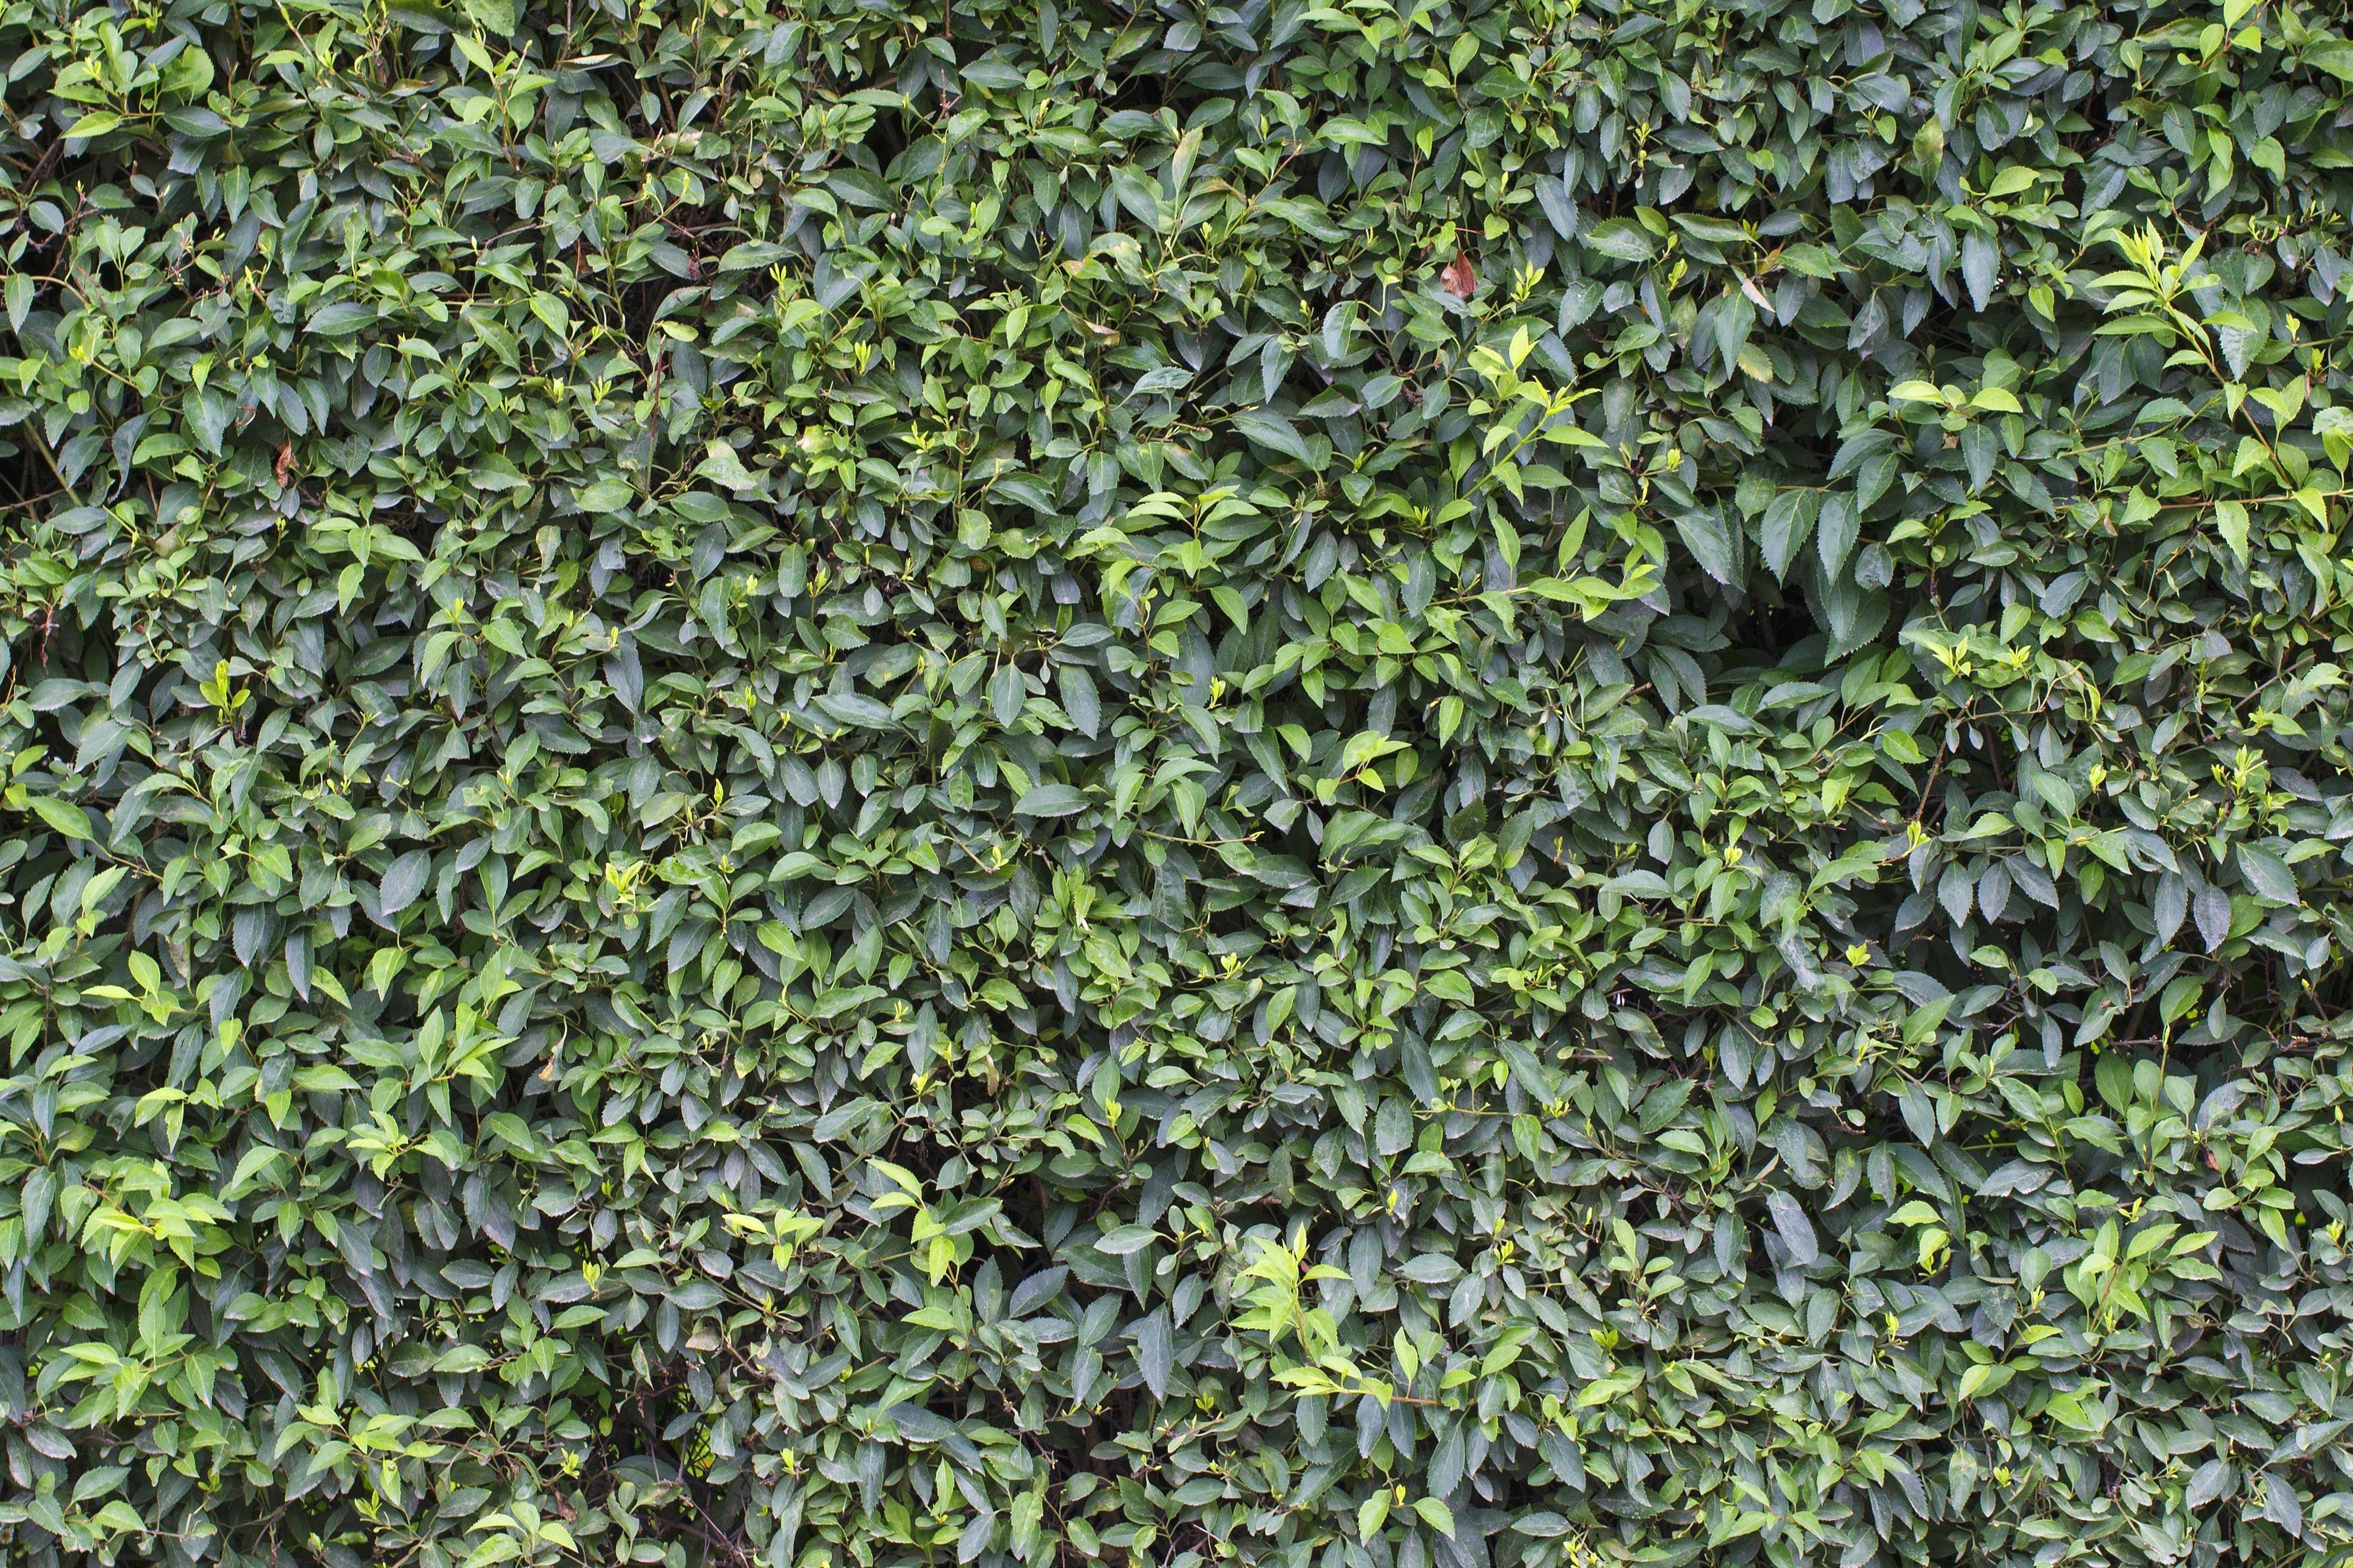 Kostenlose Bild Pflanze Blatt Flora Zaun Wachstum Garten